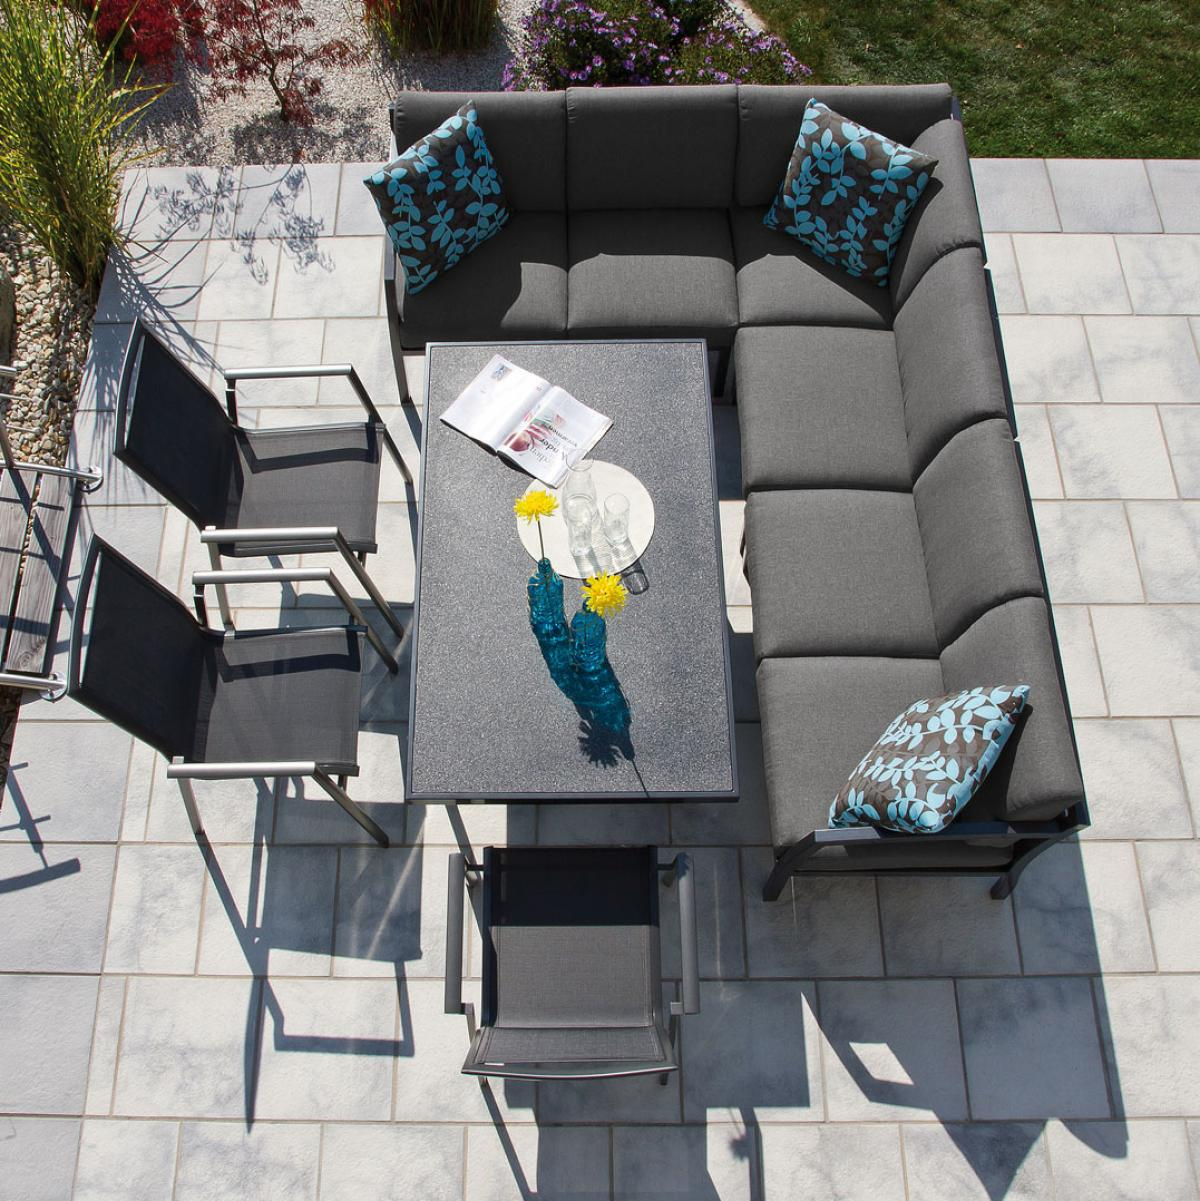 preissturz aluminium garten sitzgruppe essgruppe mit. Black Bedroom Furniture Sets. Home Design Ideas